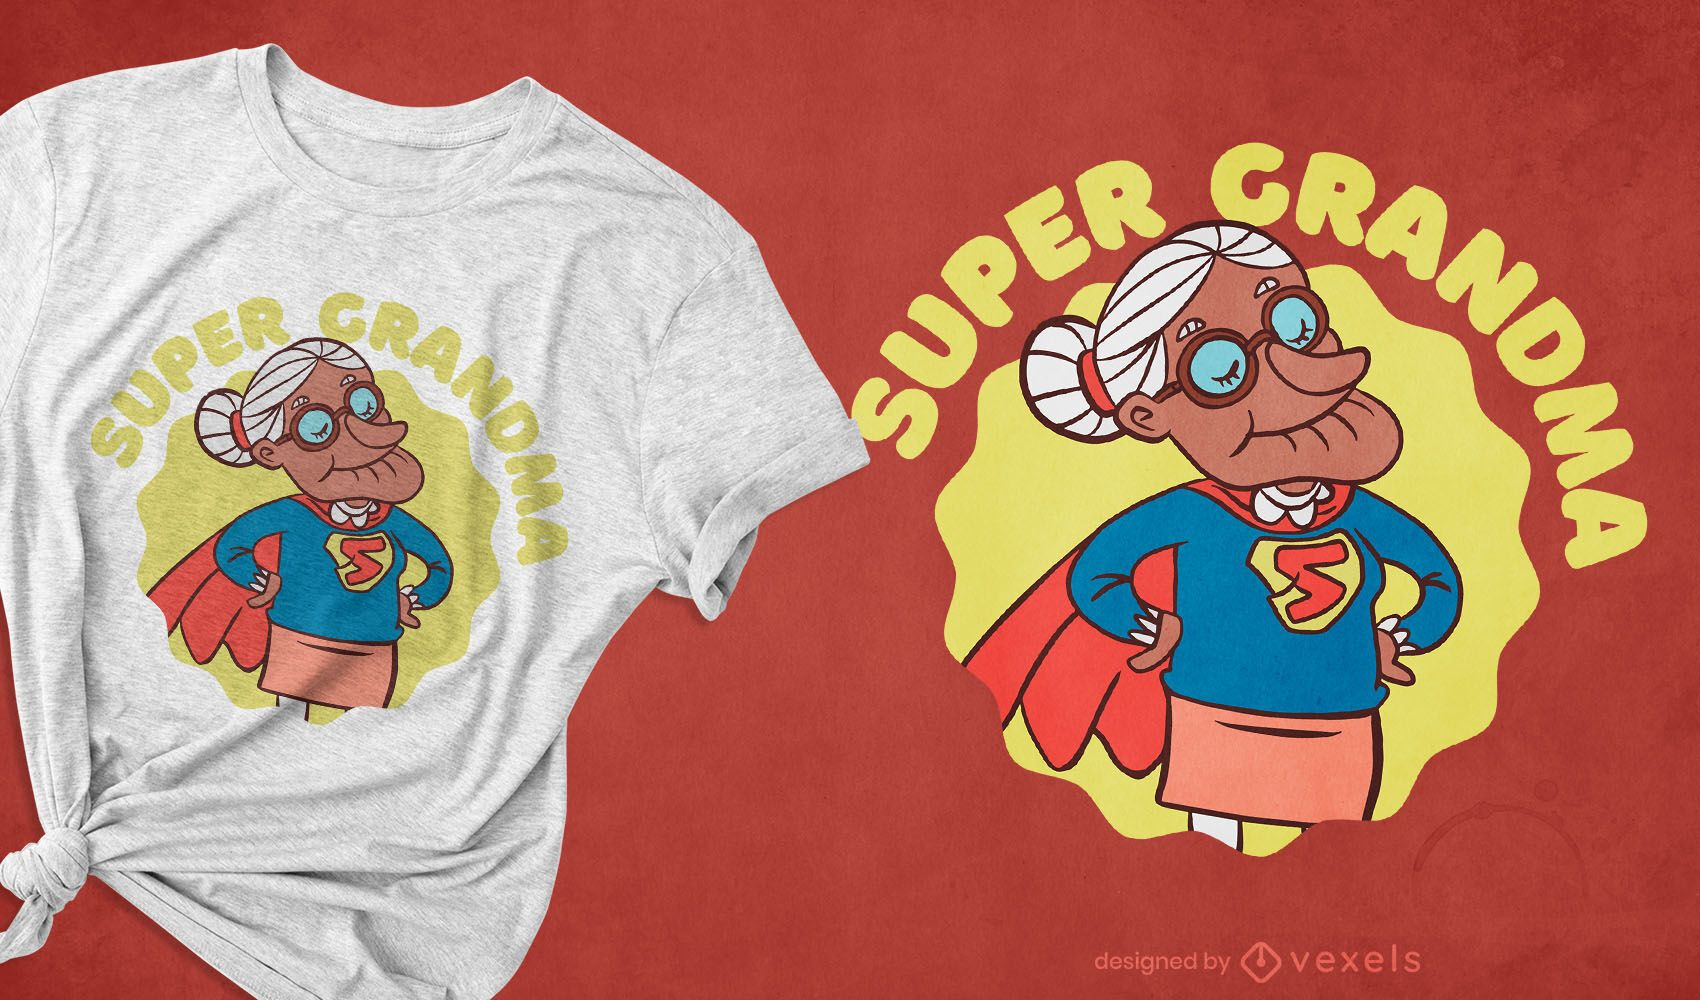 Super grandma t-shirt design